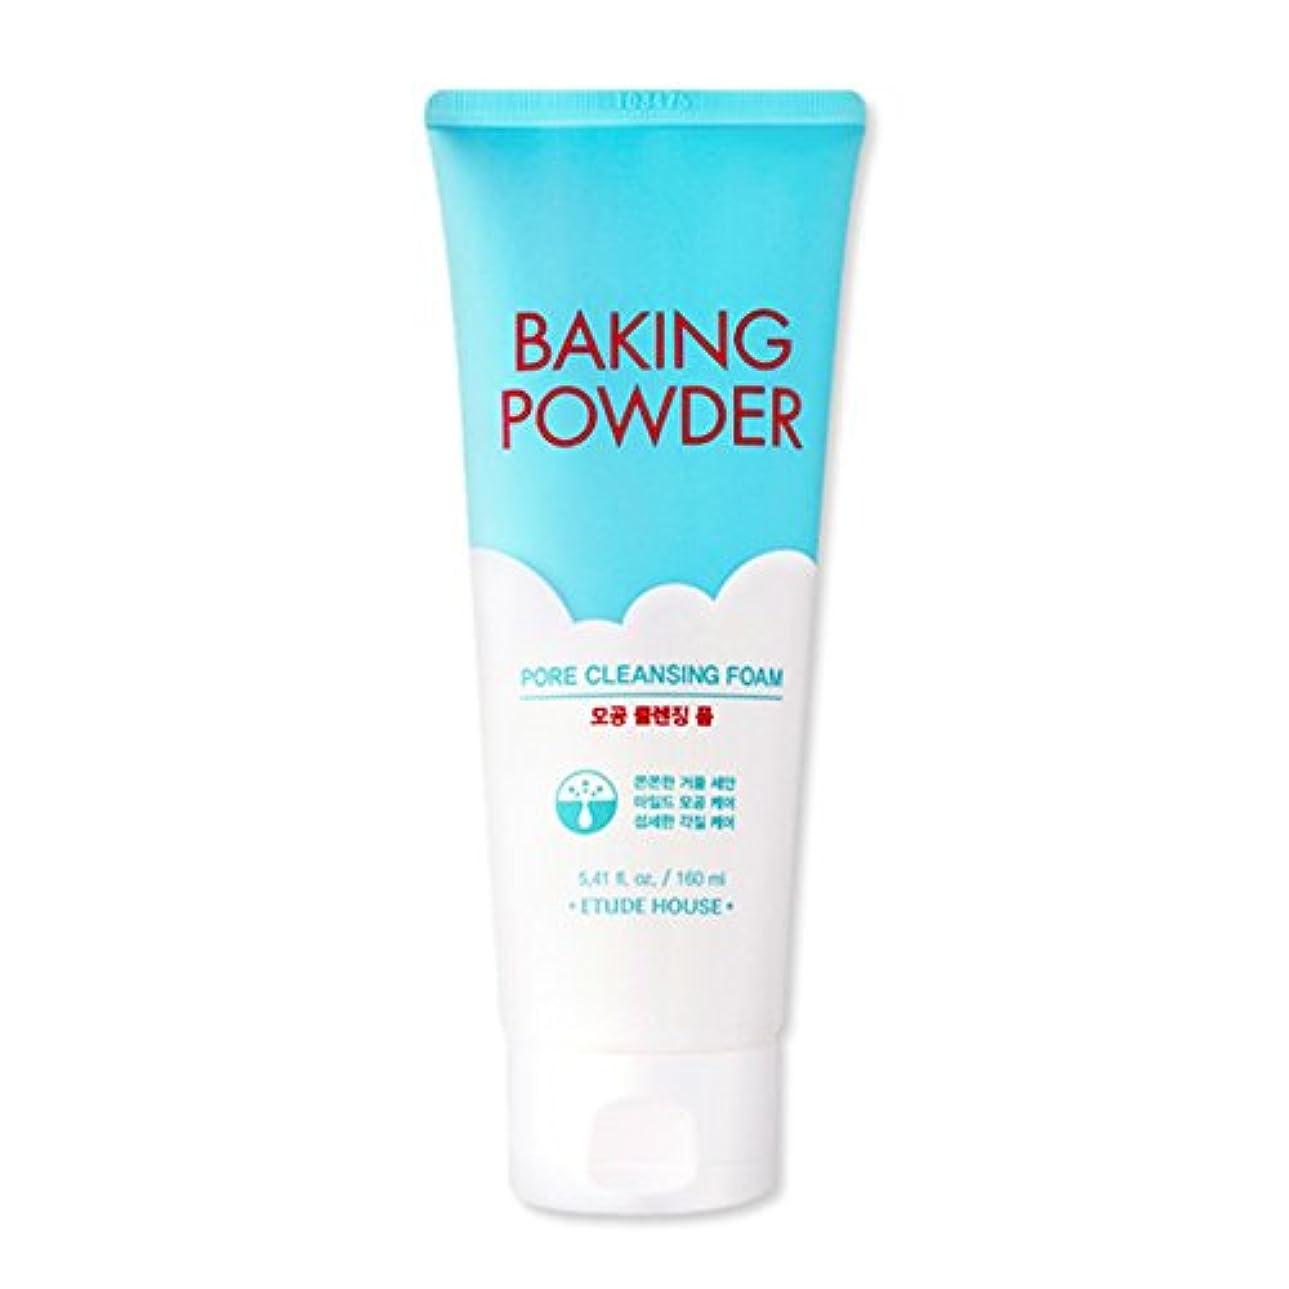 [2016 Upgrade!] ETUDE HOUSE Baking Powder Pore Cleansing Foam 160ml/エチュードハウス ベーキング パウダー ポア クレンジング フォーム 160ml